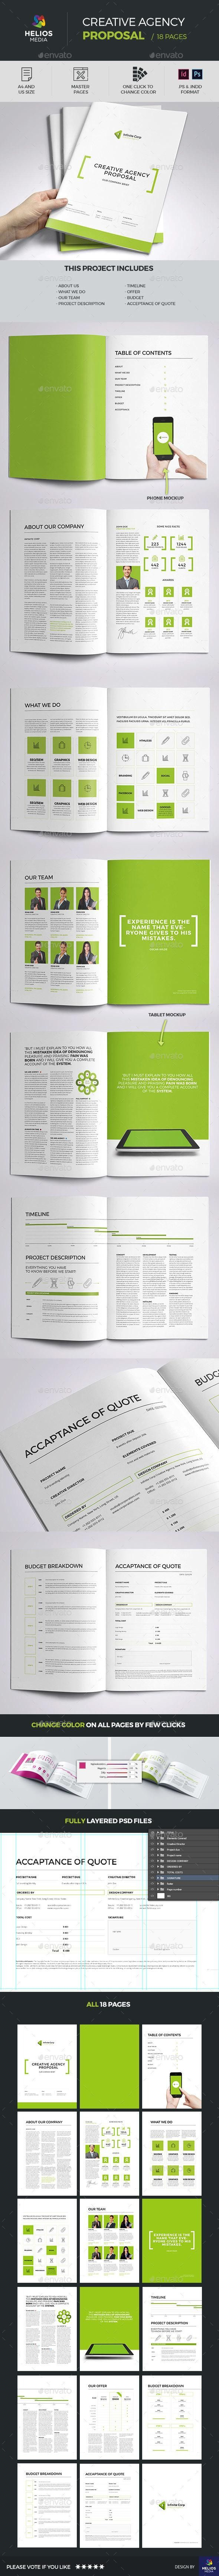 Propsal Template Invoice Design Template Print Templates Invoice Design